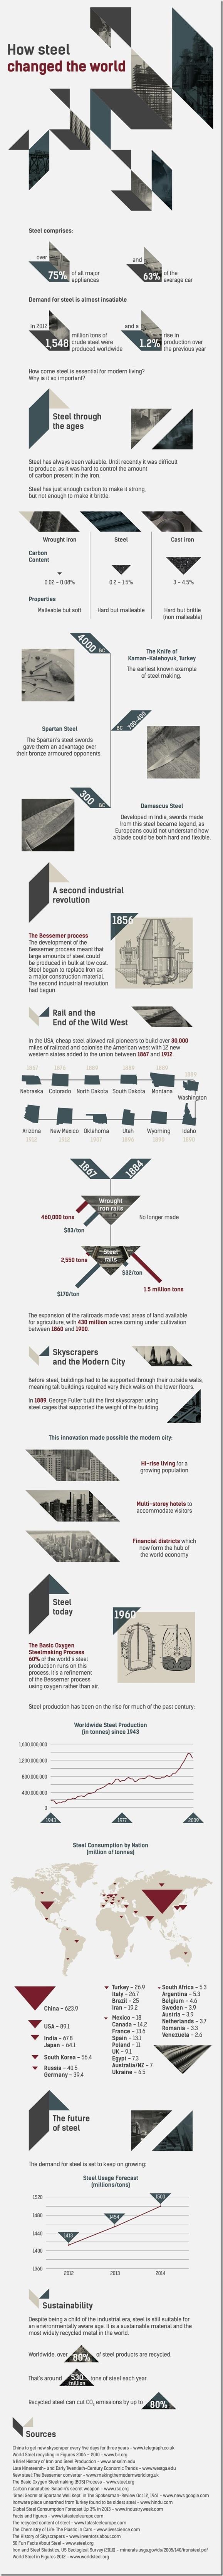 Steel Dominion-Infographic